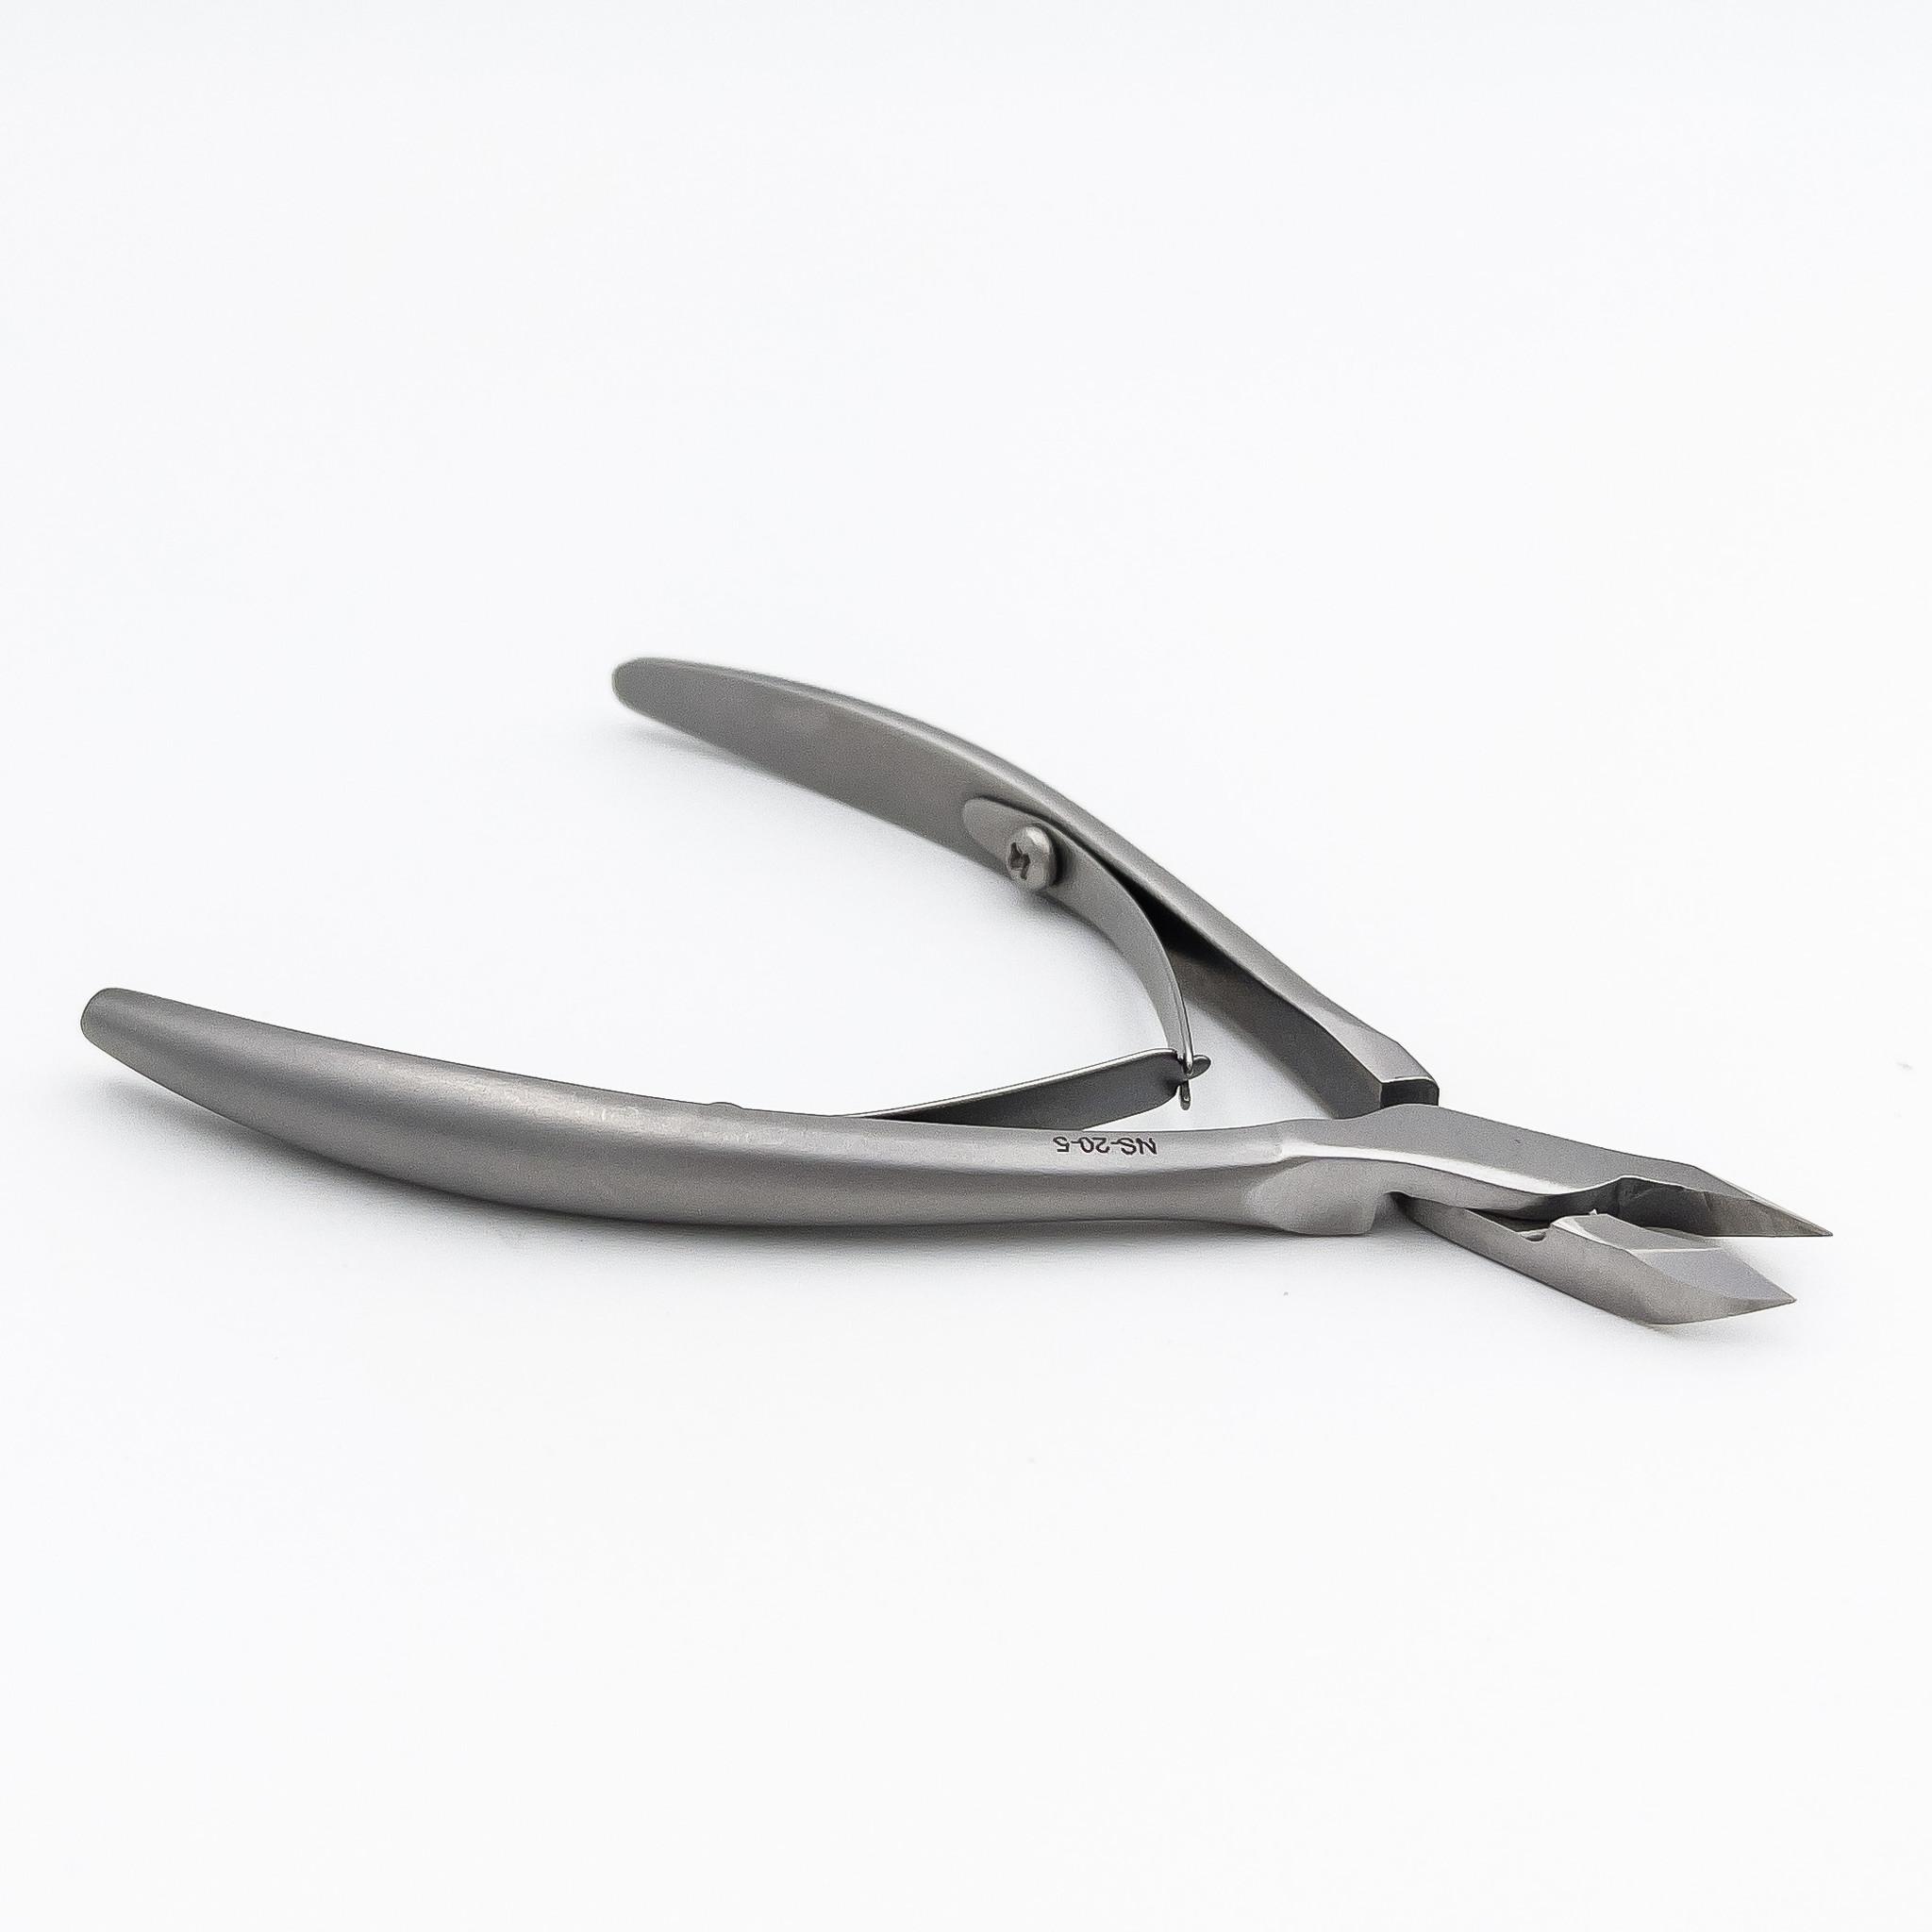 STALENA Vellentang 5 mm - lange handgreep KE-05  (NS-20-5)